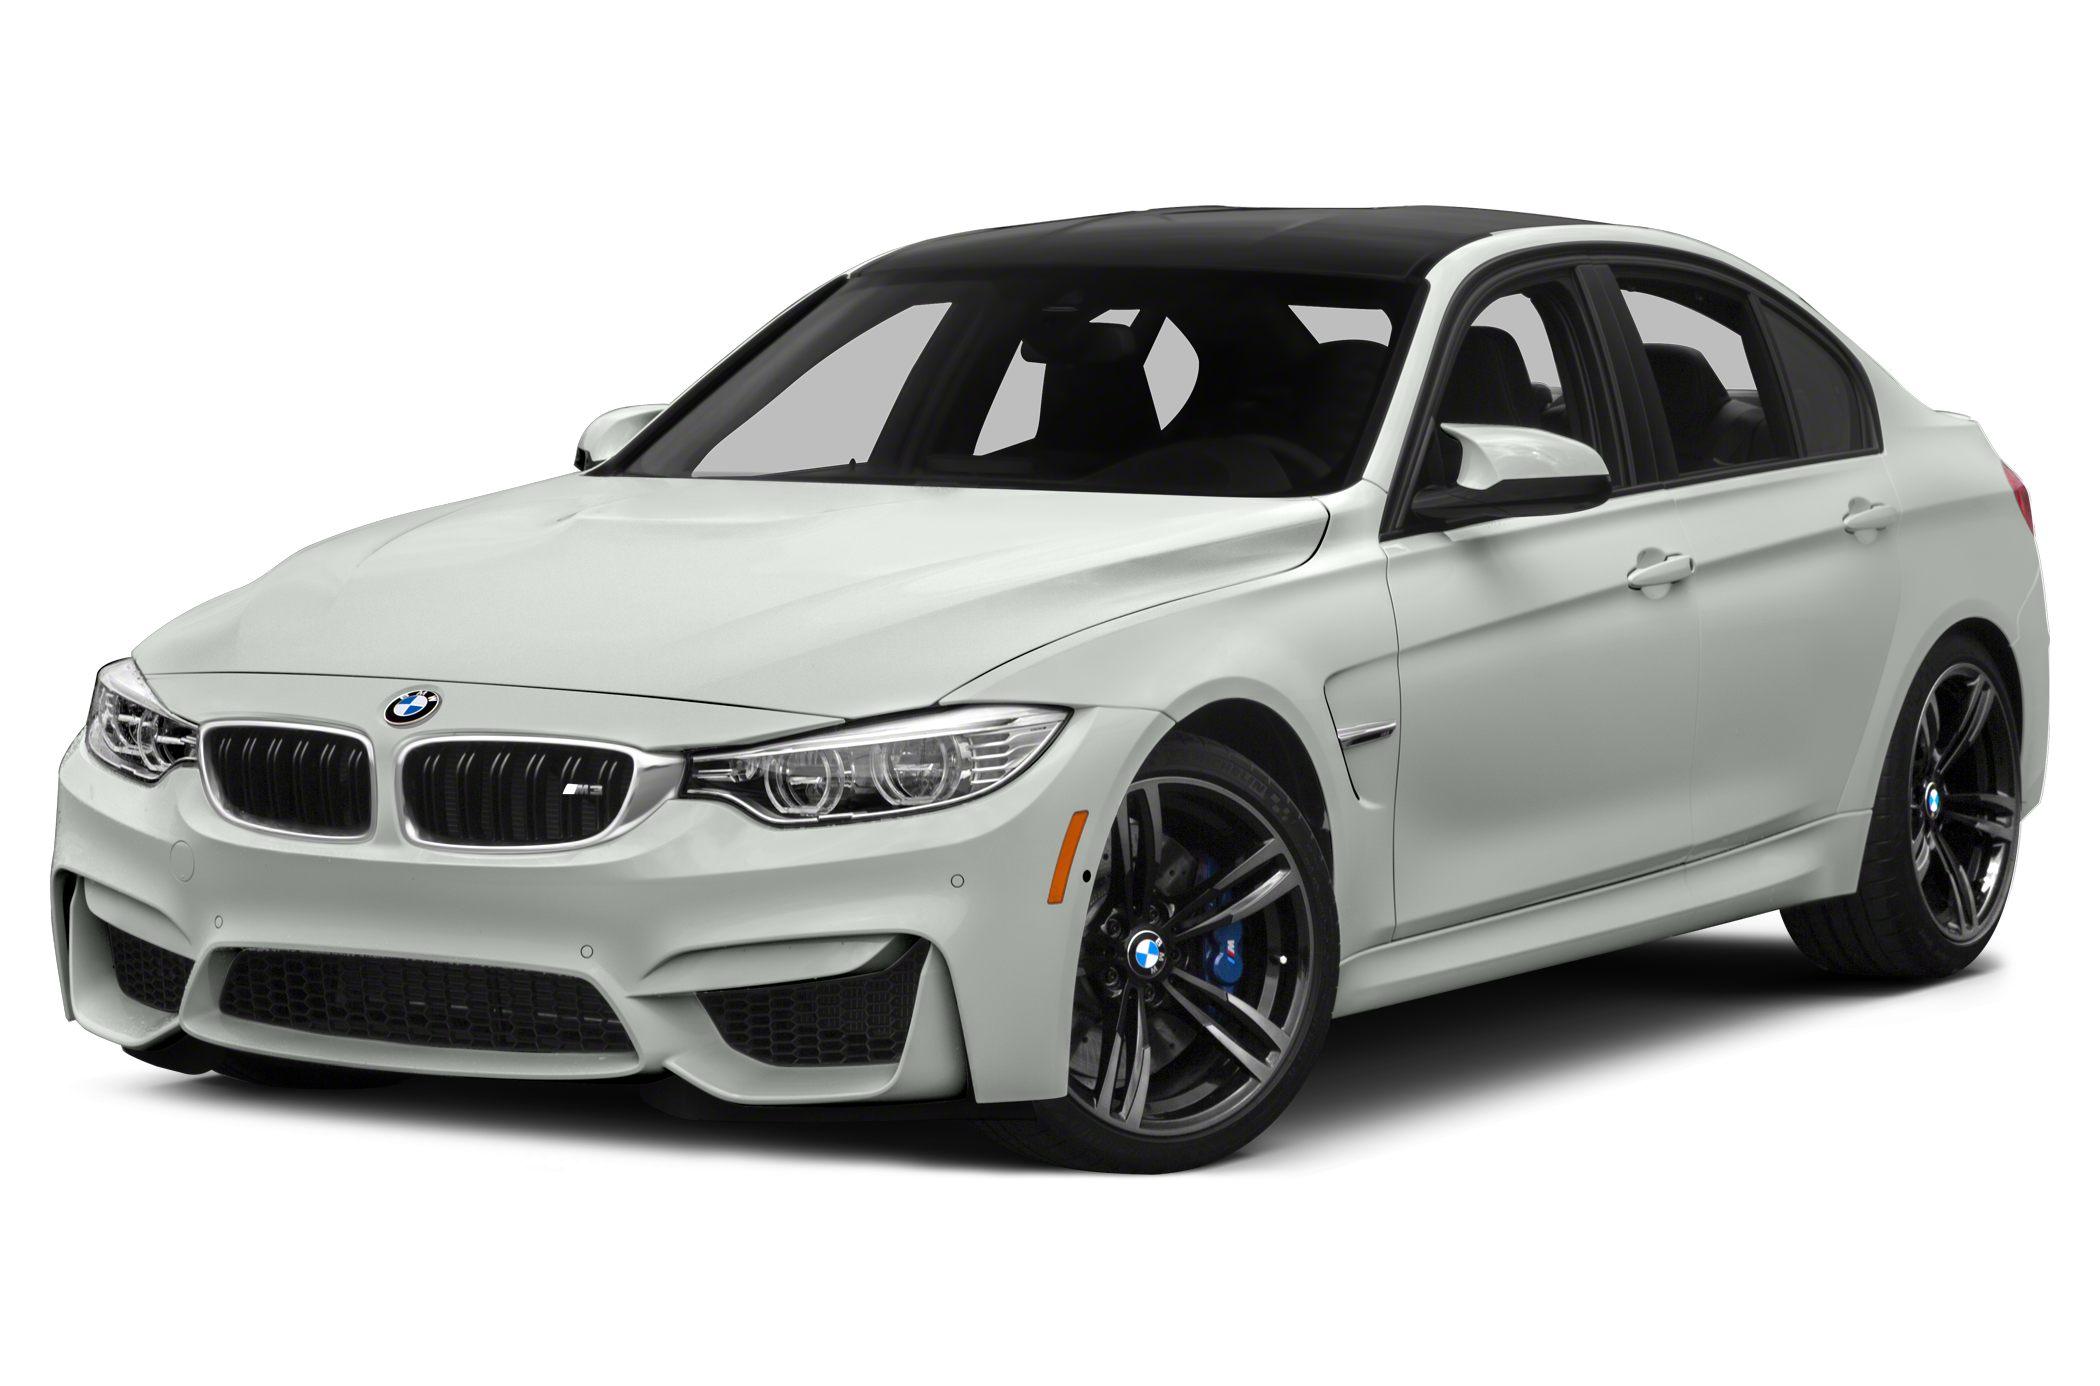 2015 BMW M3 Base 4dr Rear wheel Drive Sedan for Sale